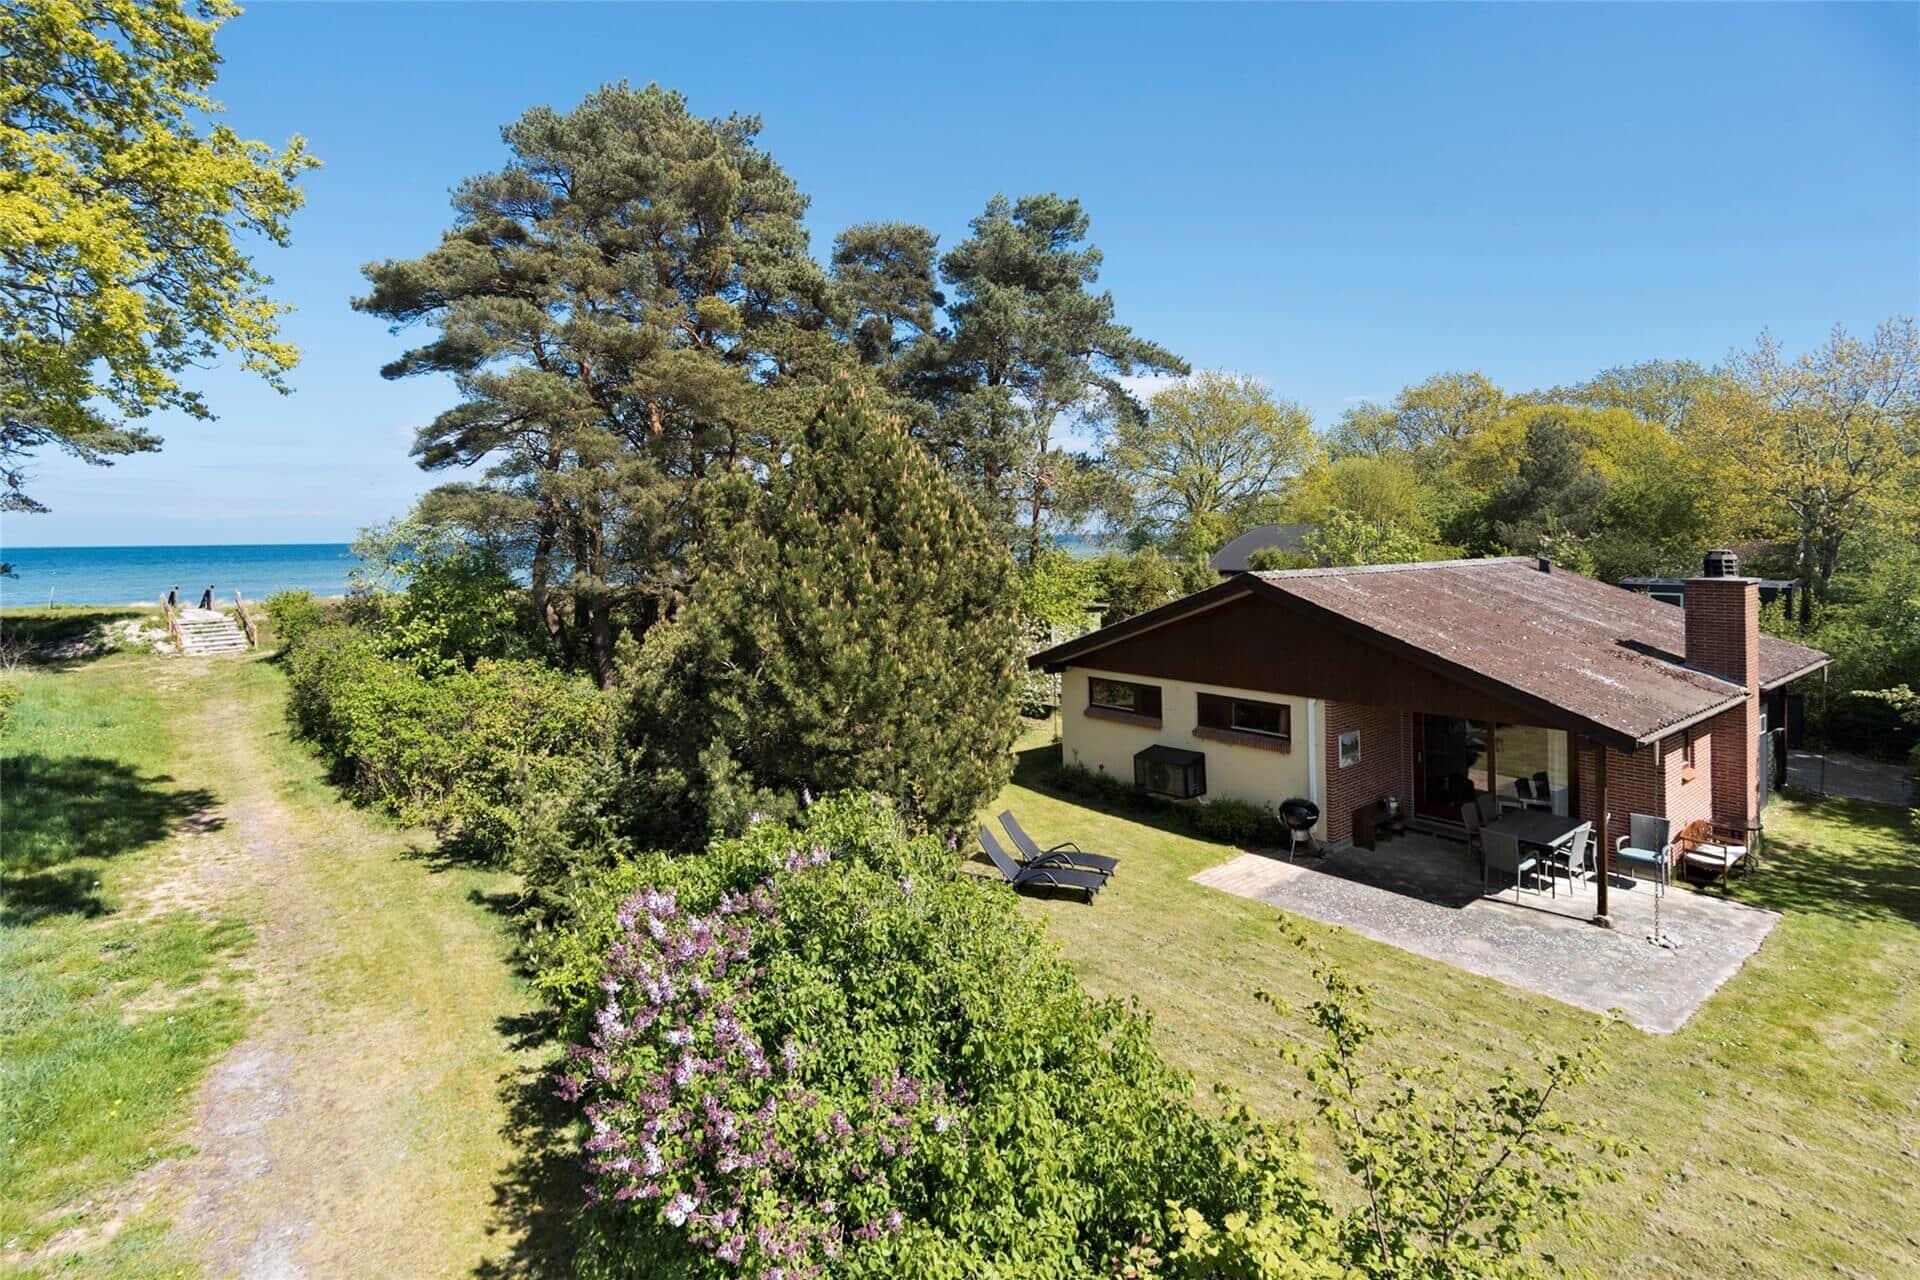 Bild 1-15 Ferienhaus 1037, Kristtjørnvej 23, DK - 4780 Stege